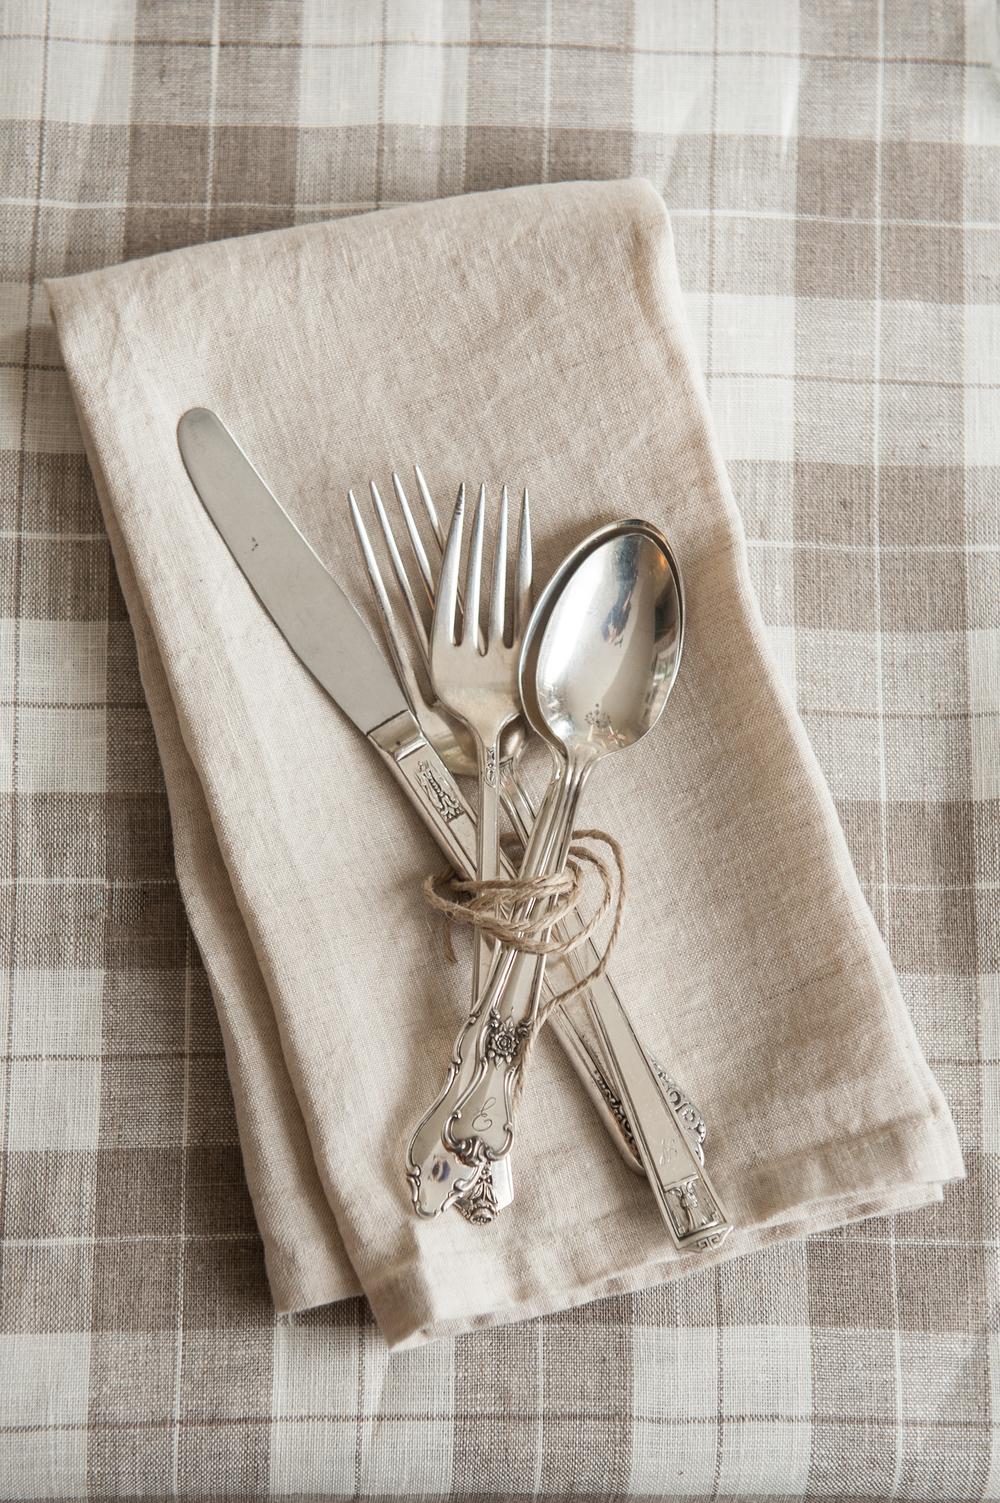 silverware_with_linen_napkin